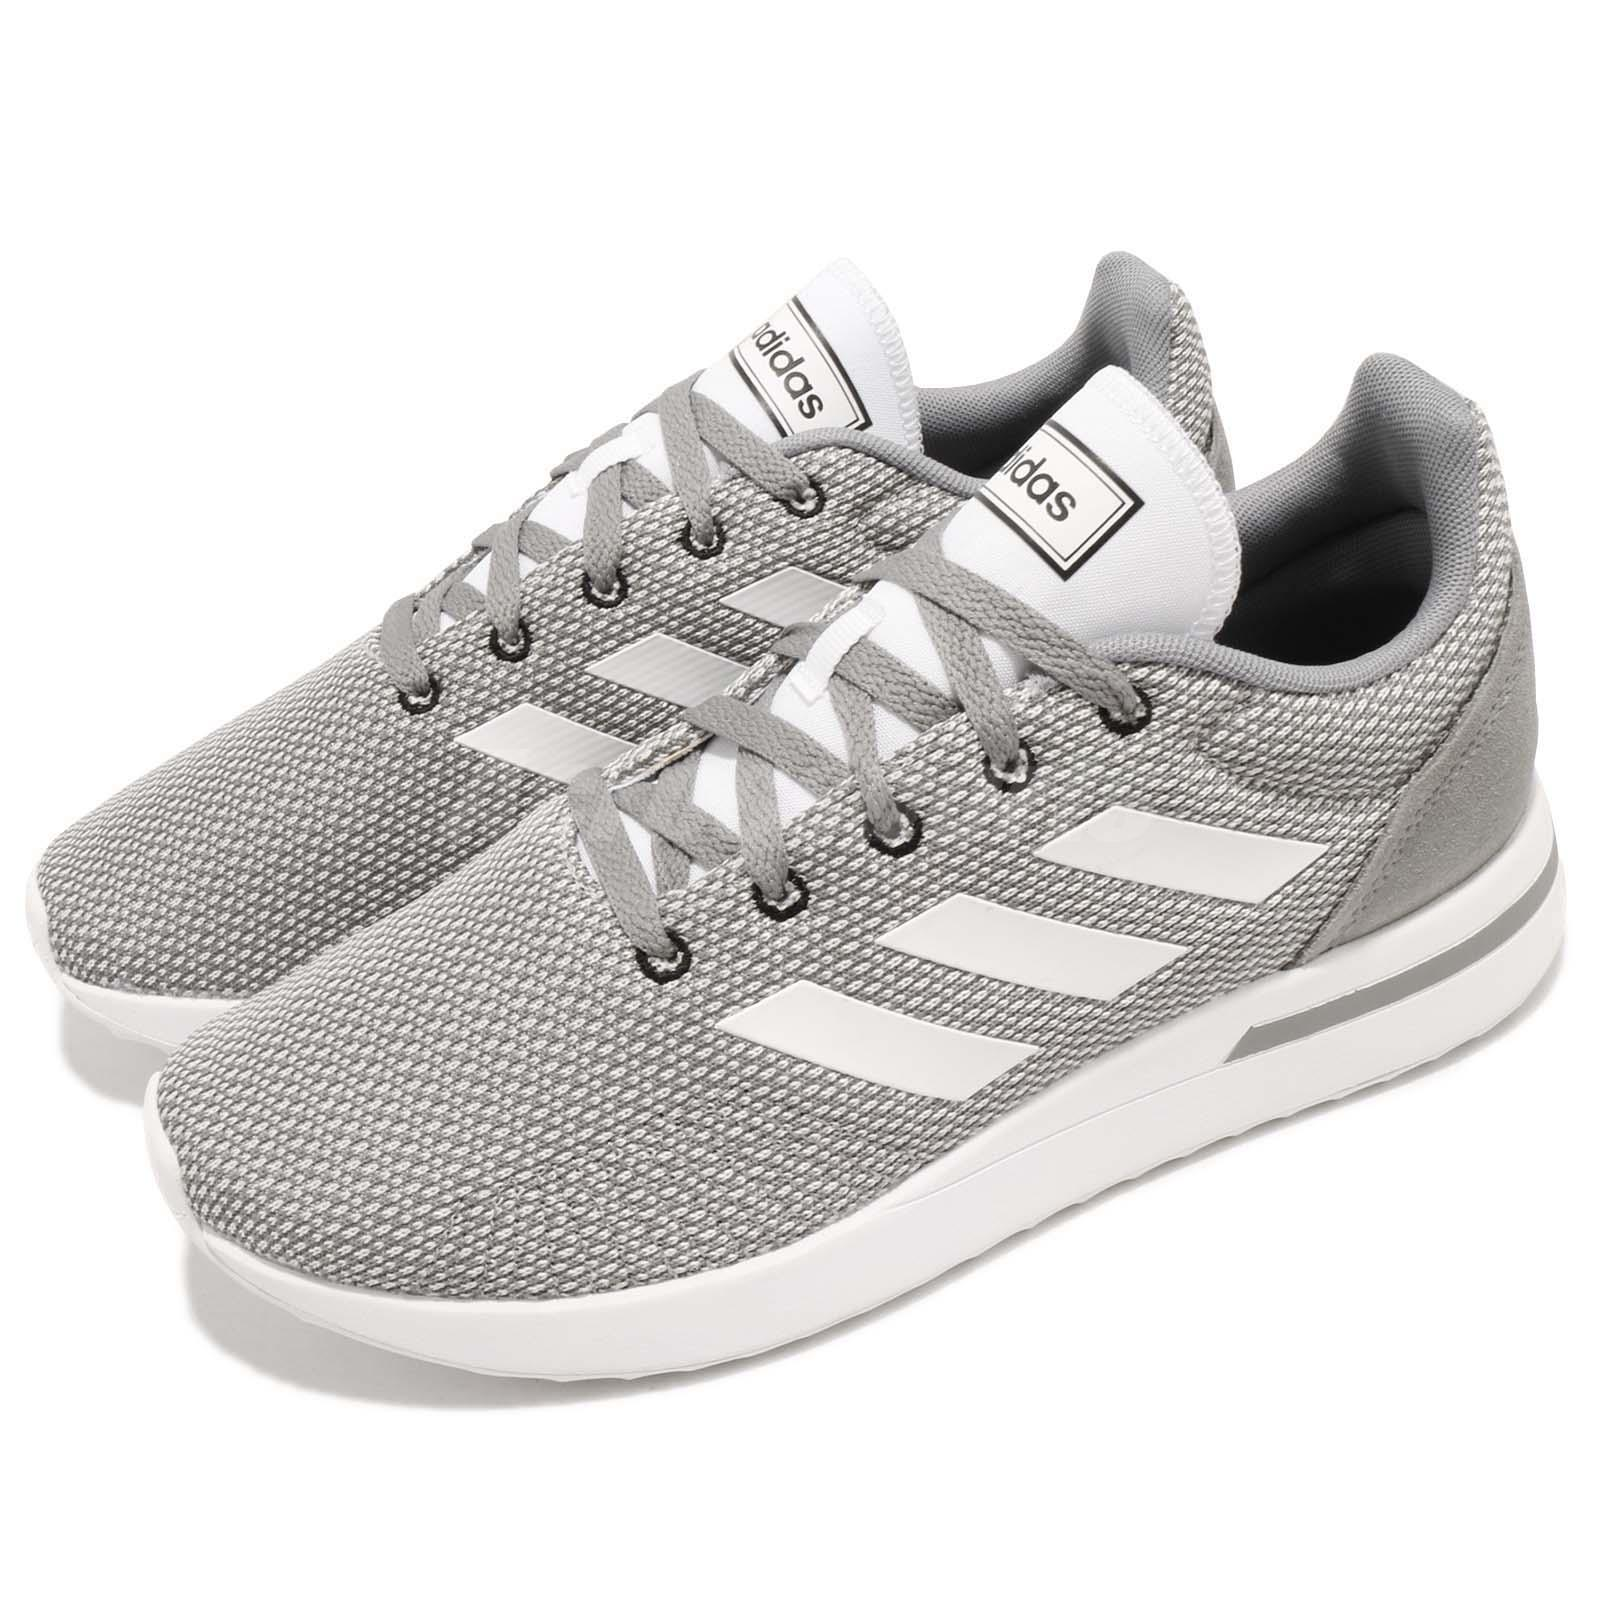 adidas Run 70s Gris Footwear Blanc Men Running Casual Chaussures Baskets